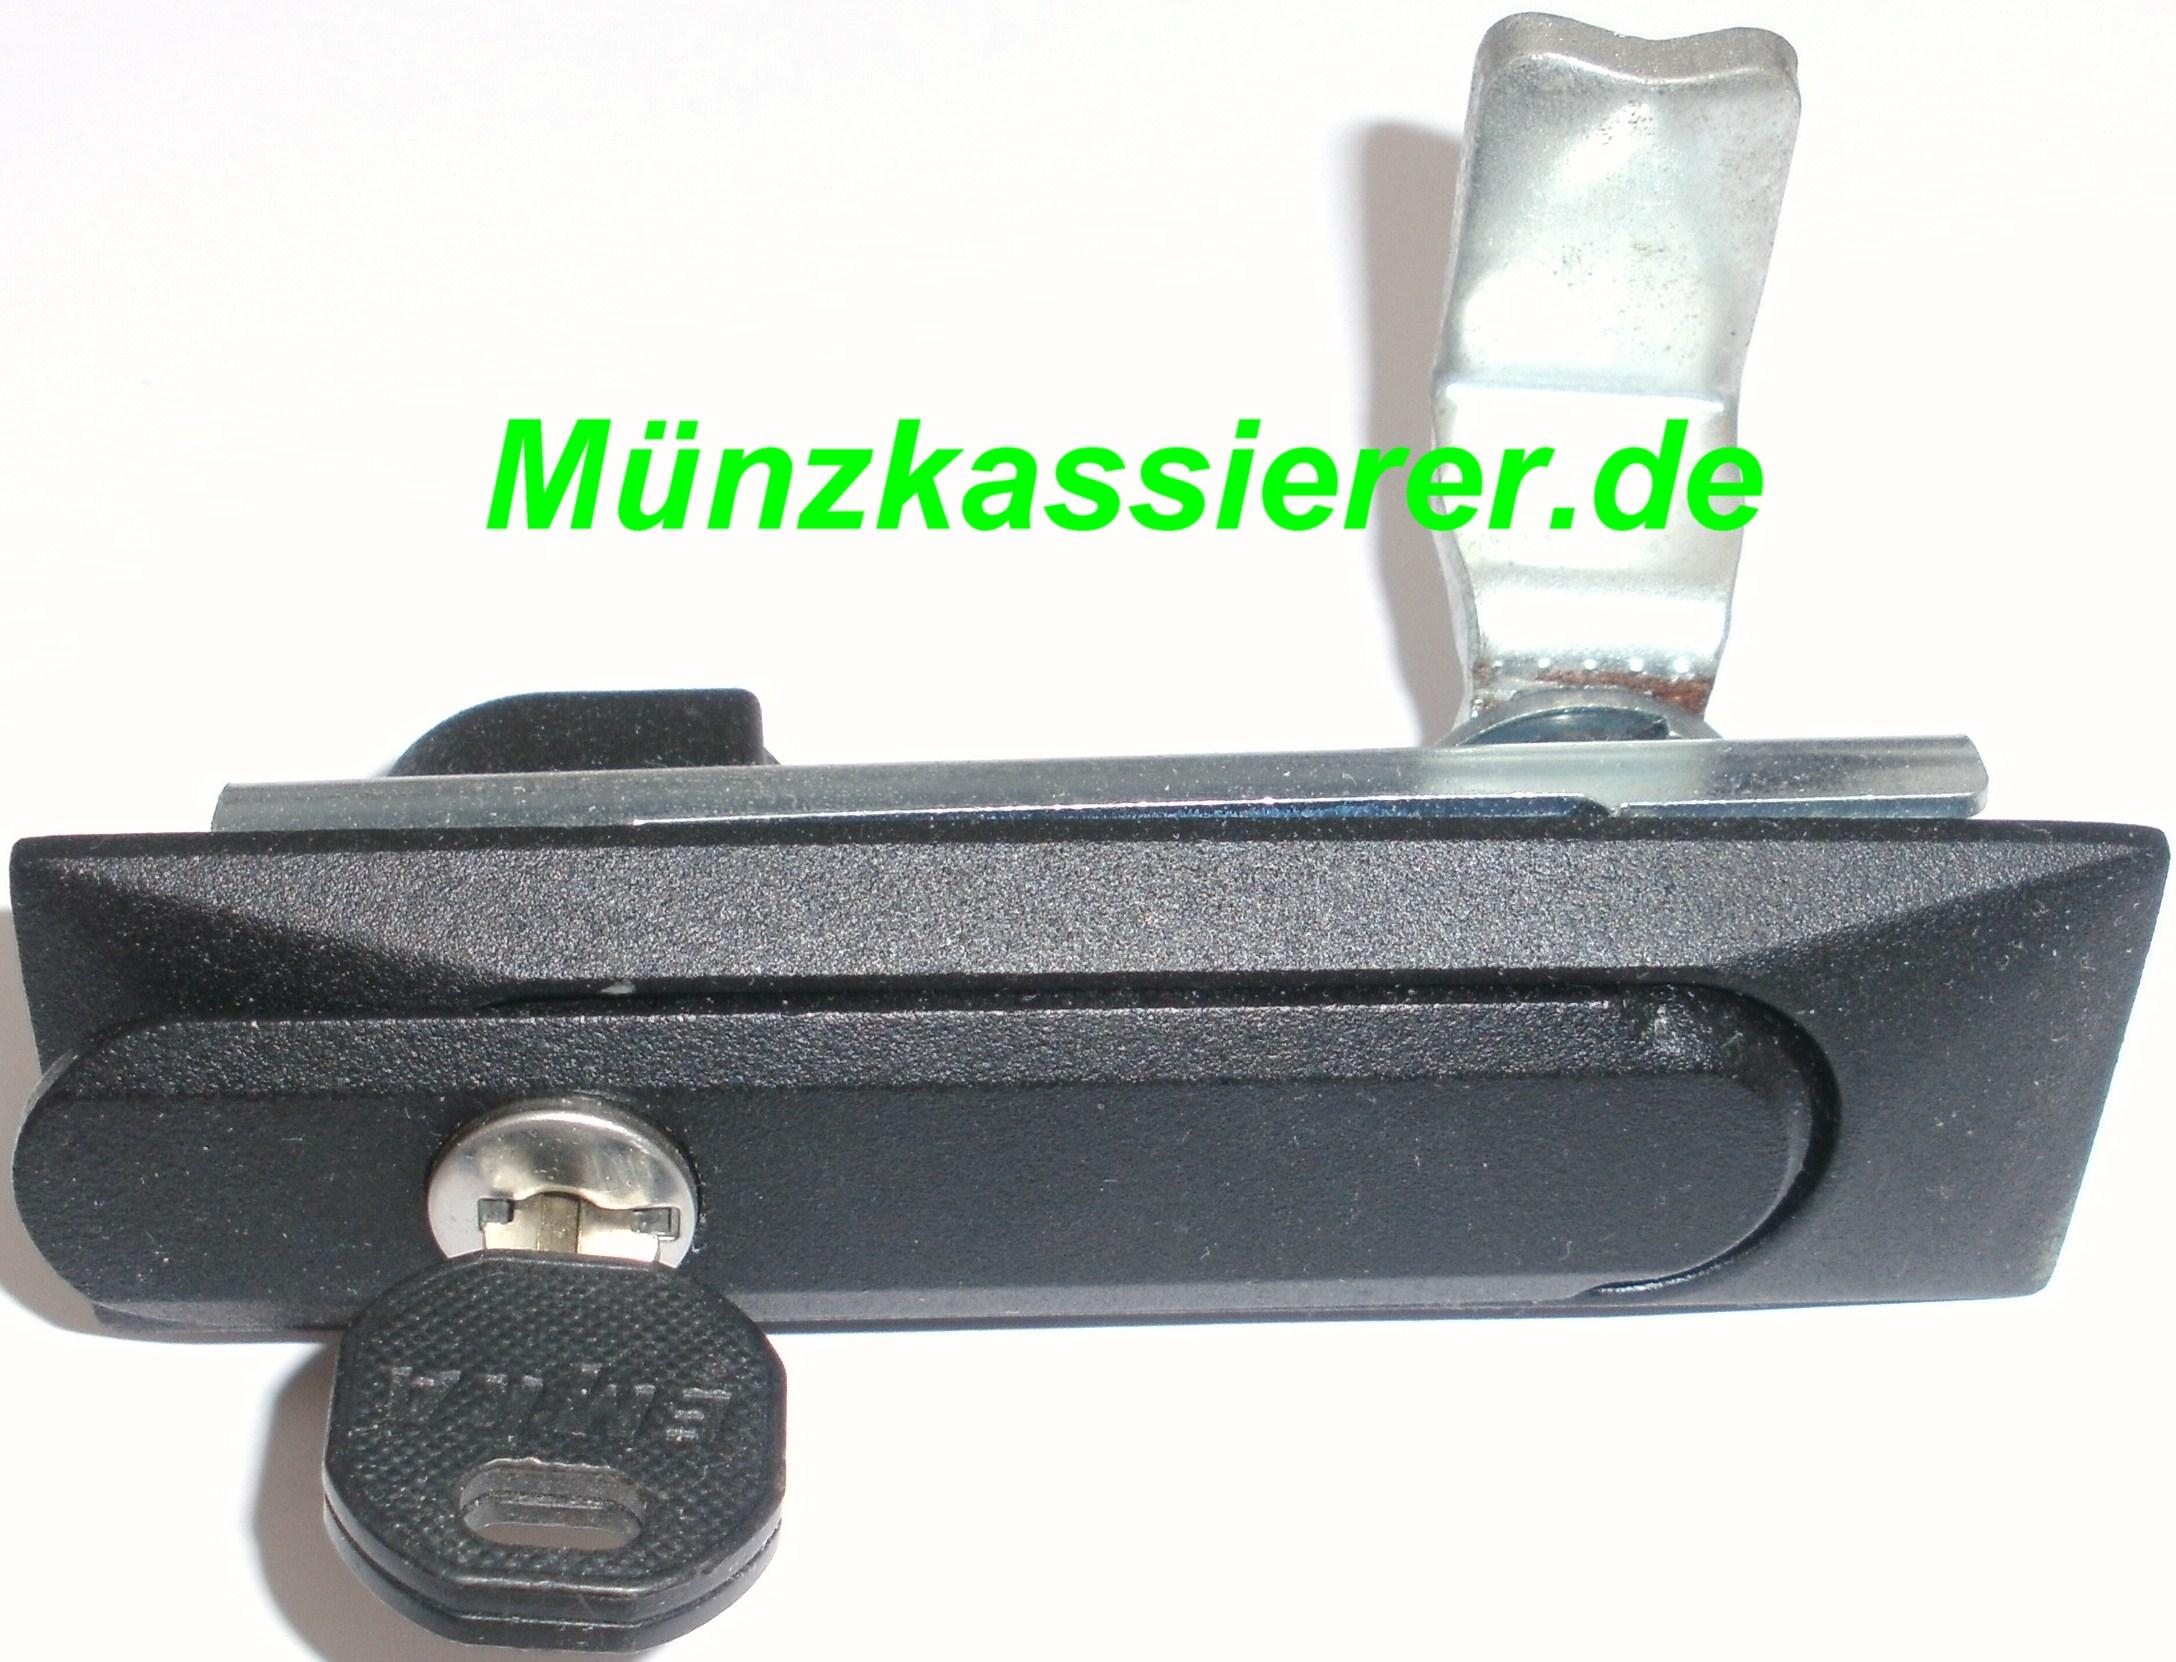 Münzkassierer.de Münzautomaten.com SI Steuerung SI Elektronik Schloss mit Verriegelung Schlüssel